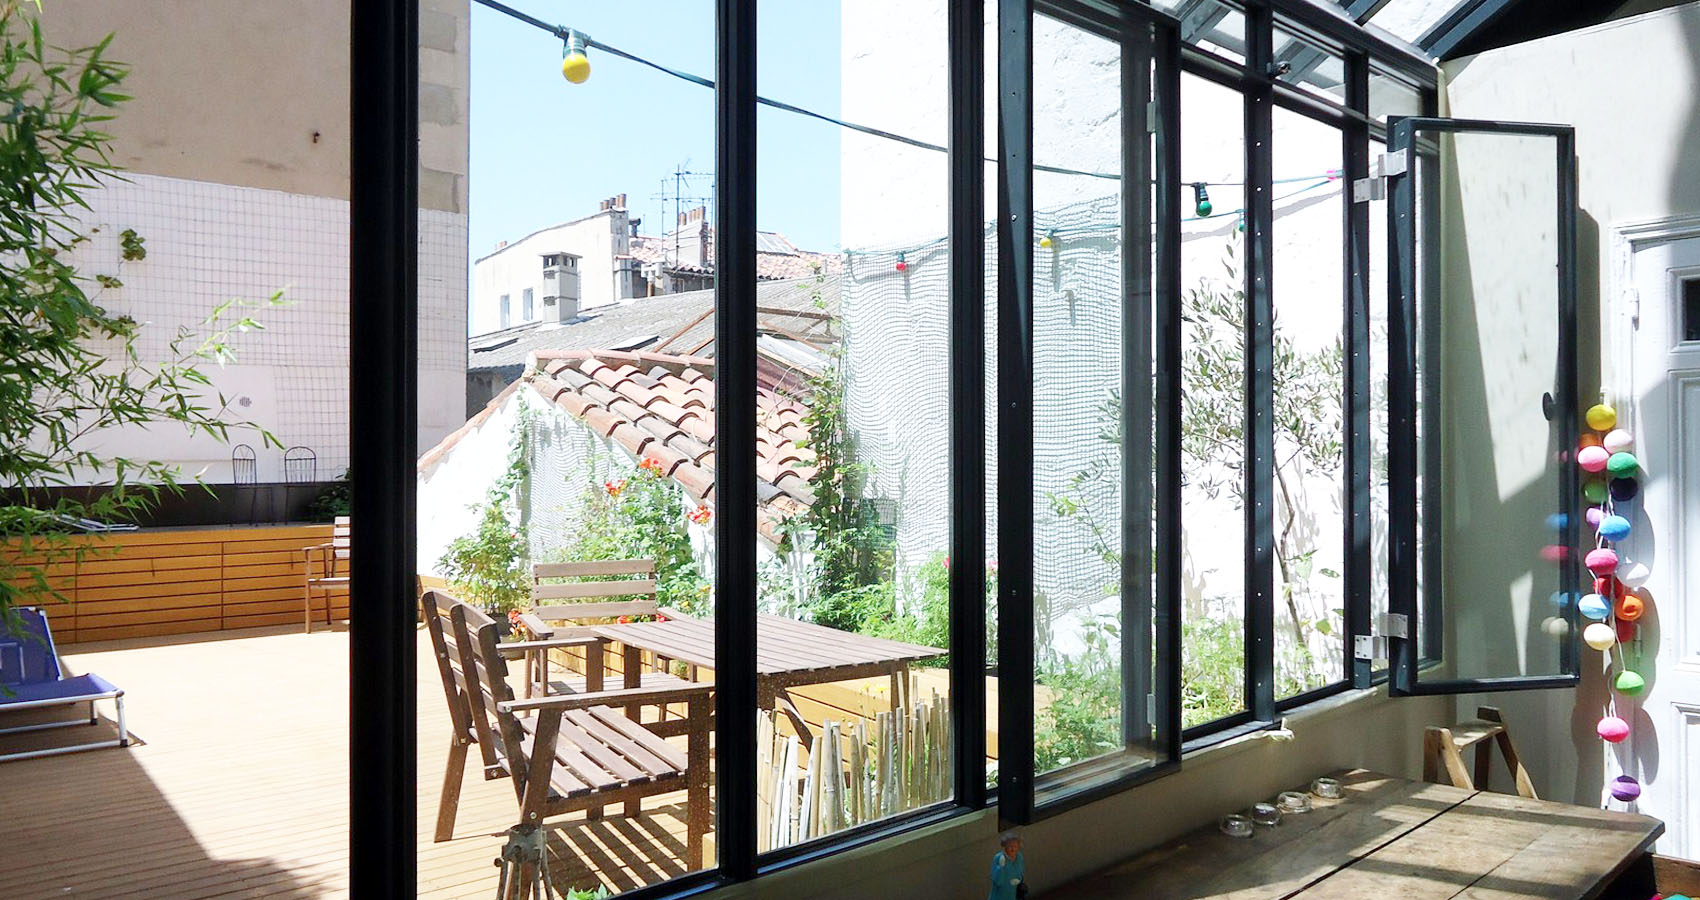 https://www.mon-artisan-ferronnier.com/wp-content/uploads/2021/05/veranda6.jpeg